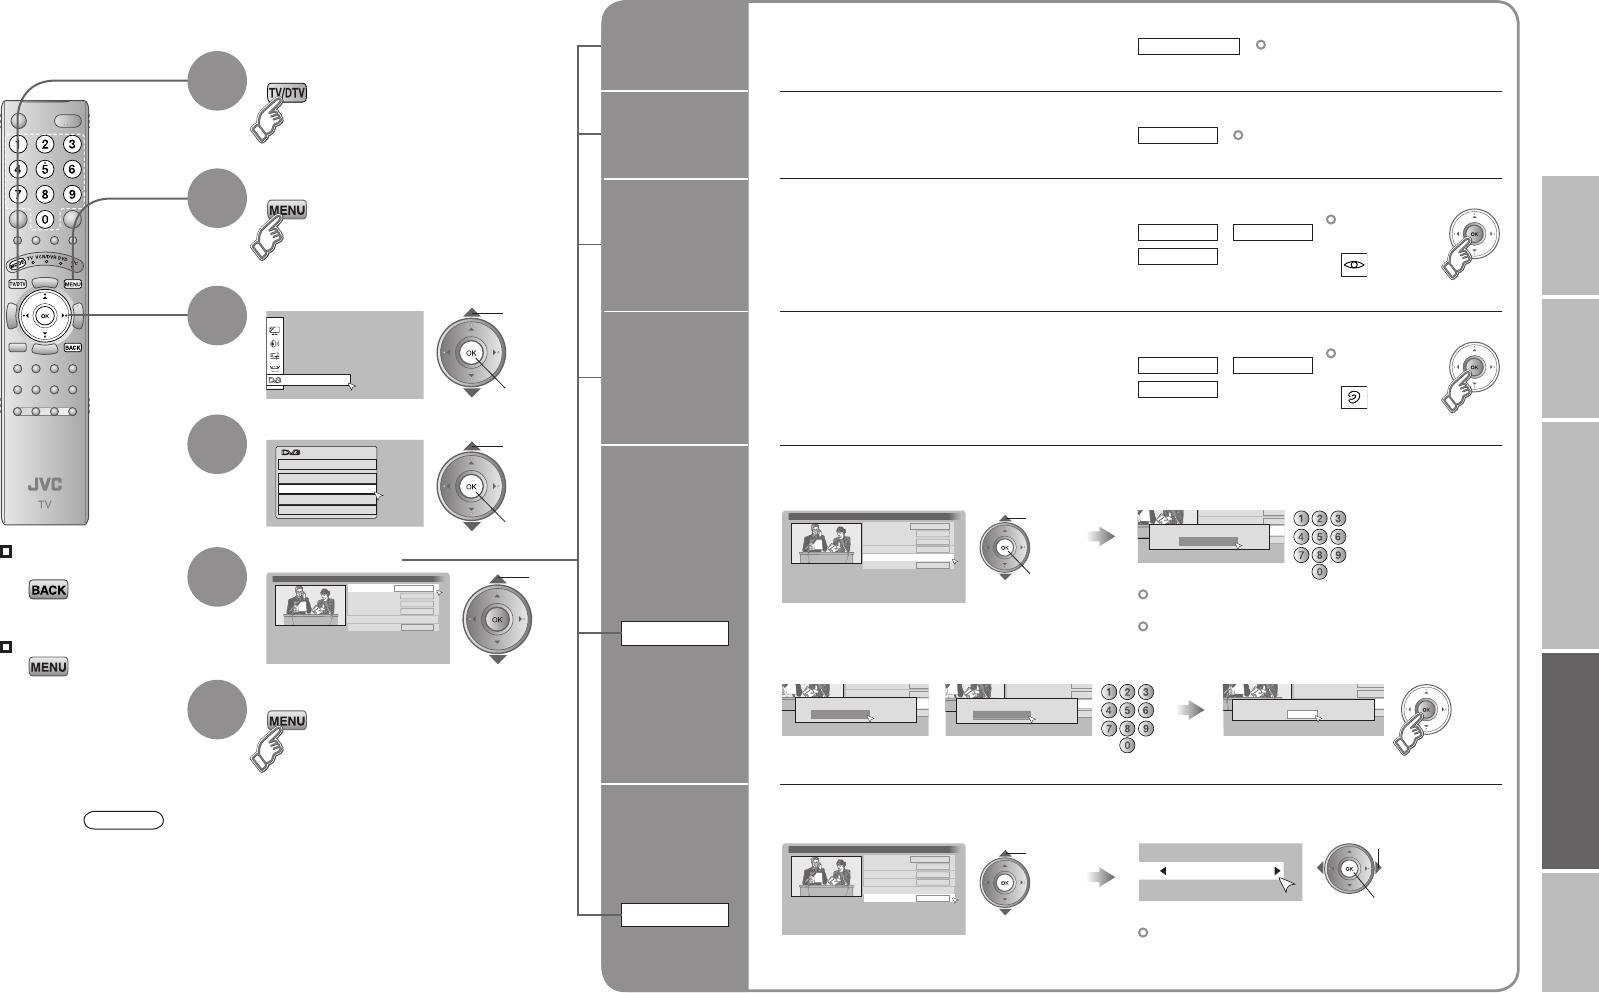 Jvc Lt 46dz7bj User Manual Lct2182 001a U En Wiring Diagram For S17 41